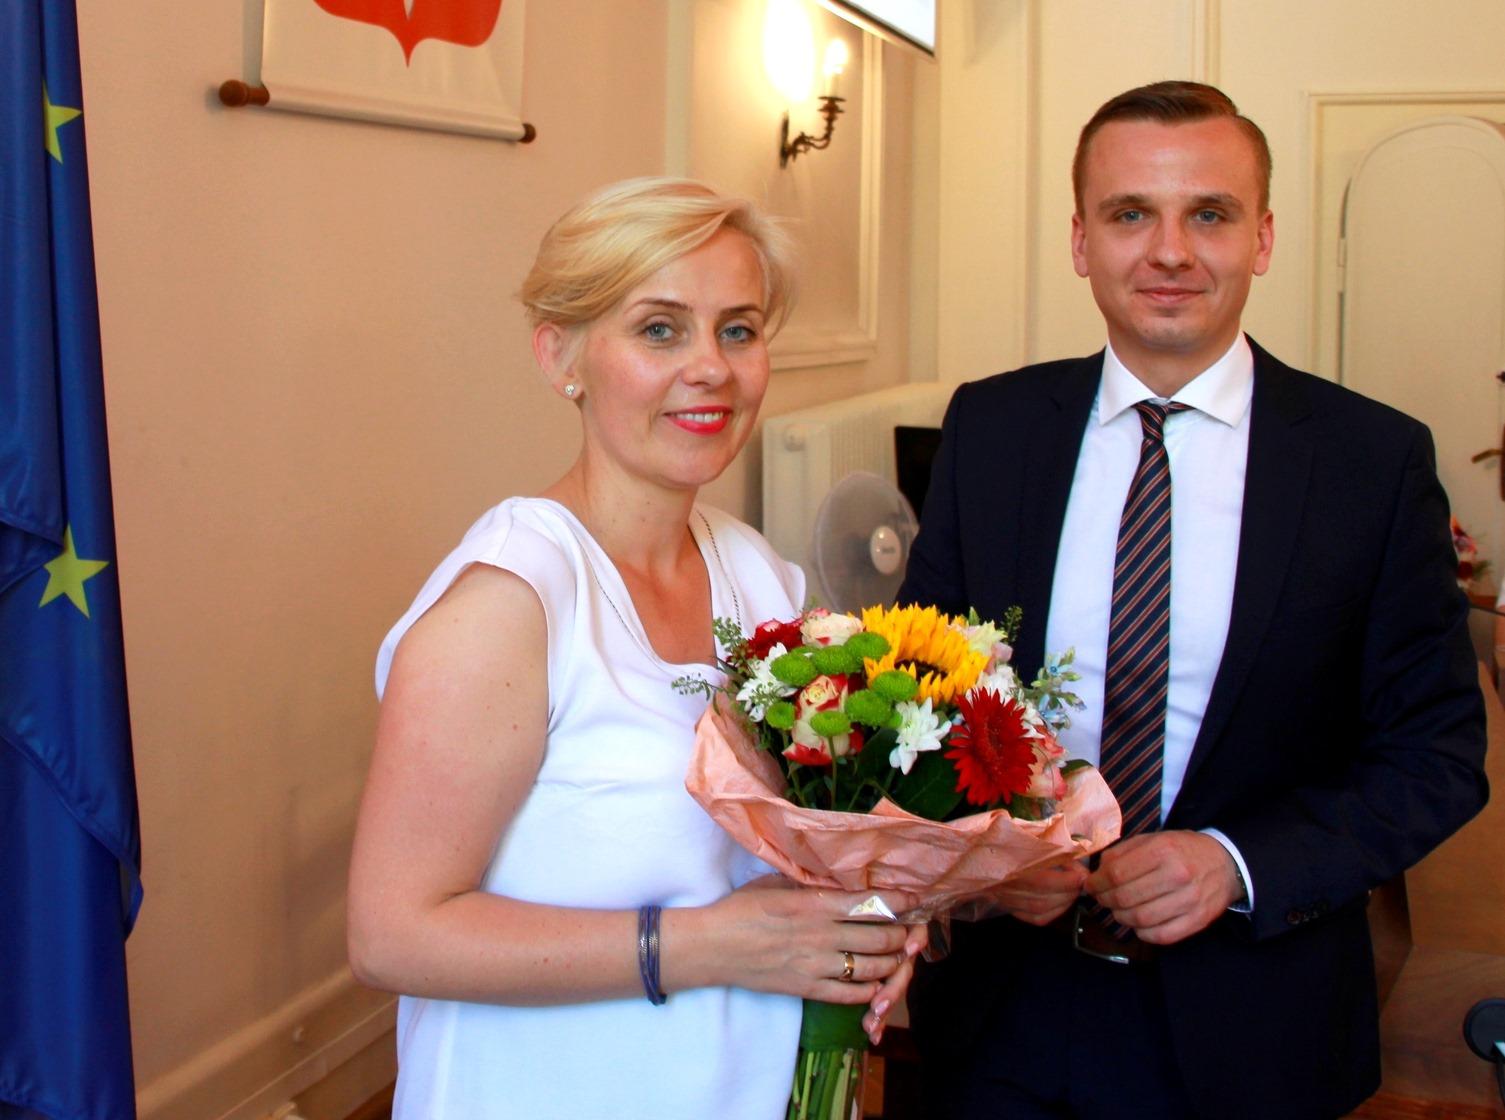 Burmistrz z absolutorium, Miasto Białogard